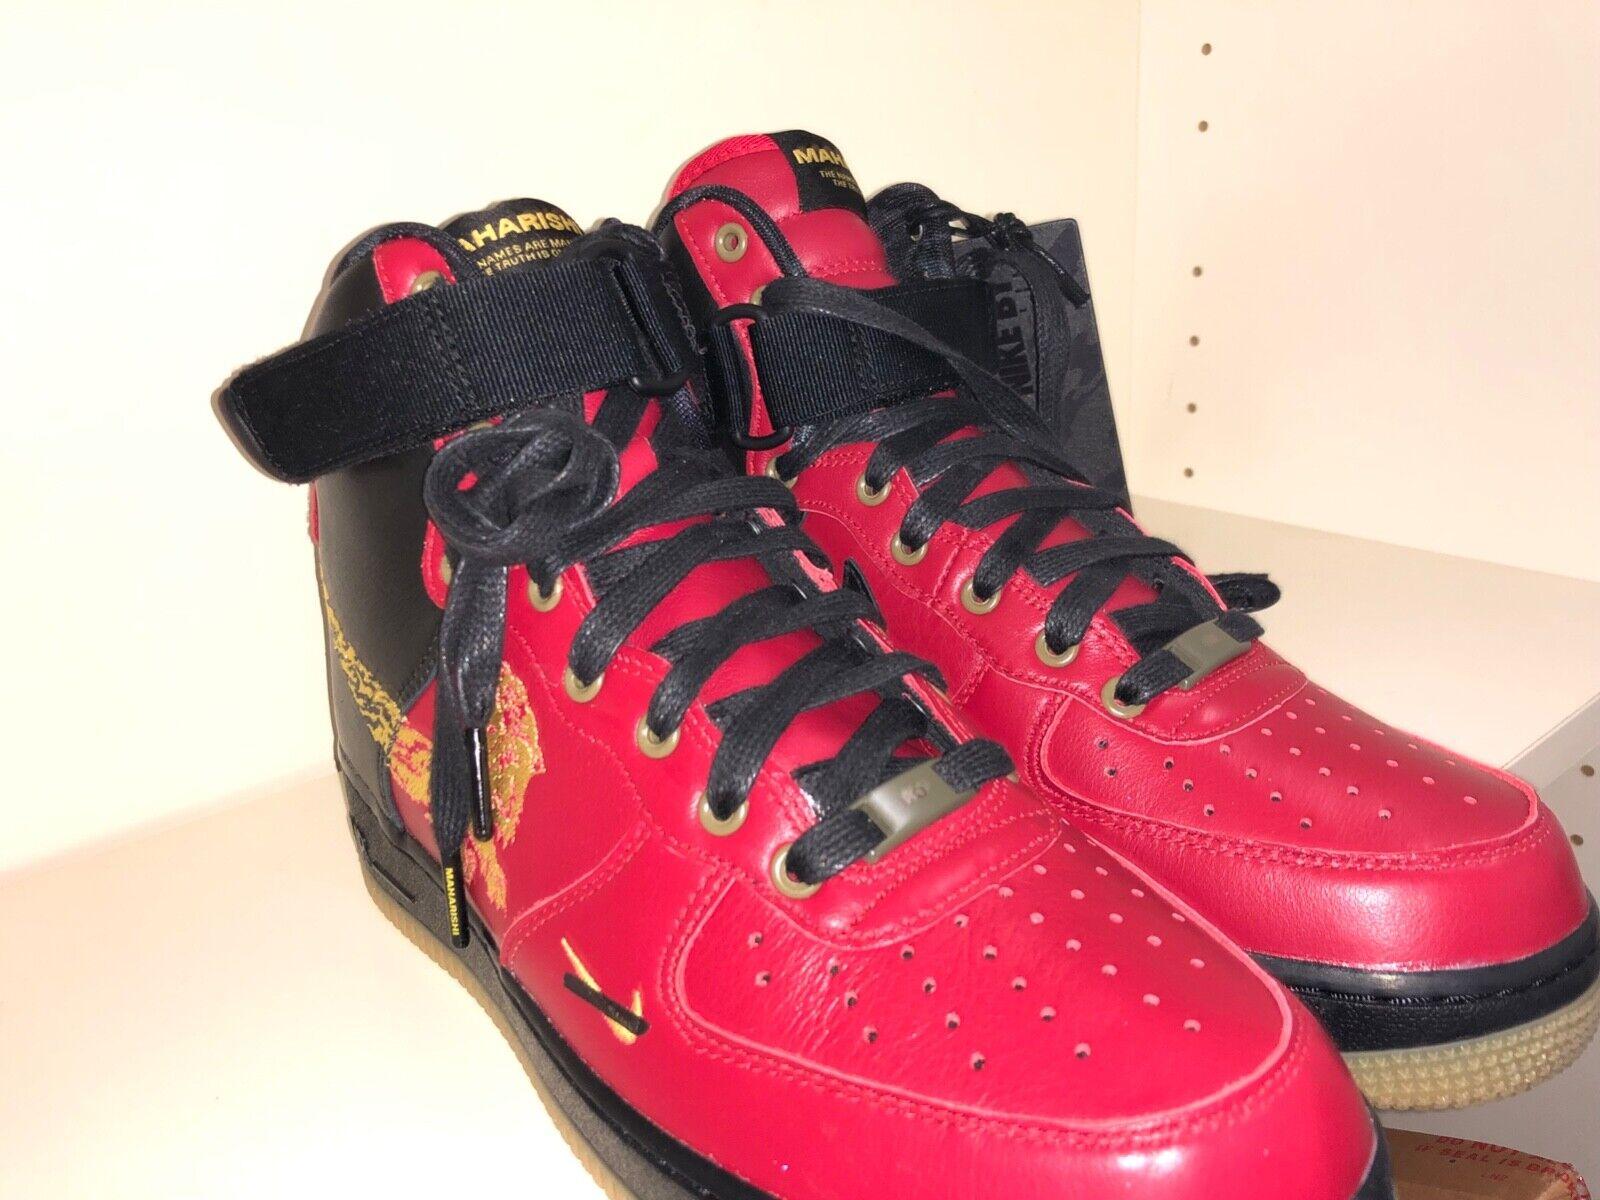 Nike Air Force 1 High by maharishi nero rosso, 42 EU, New